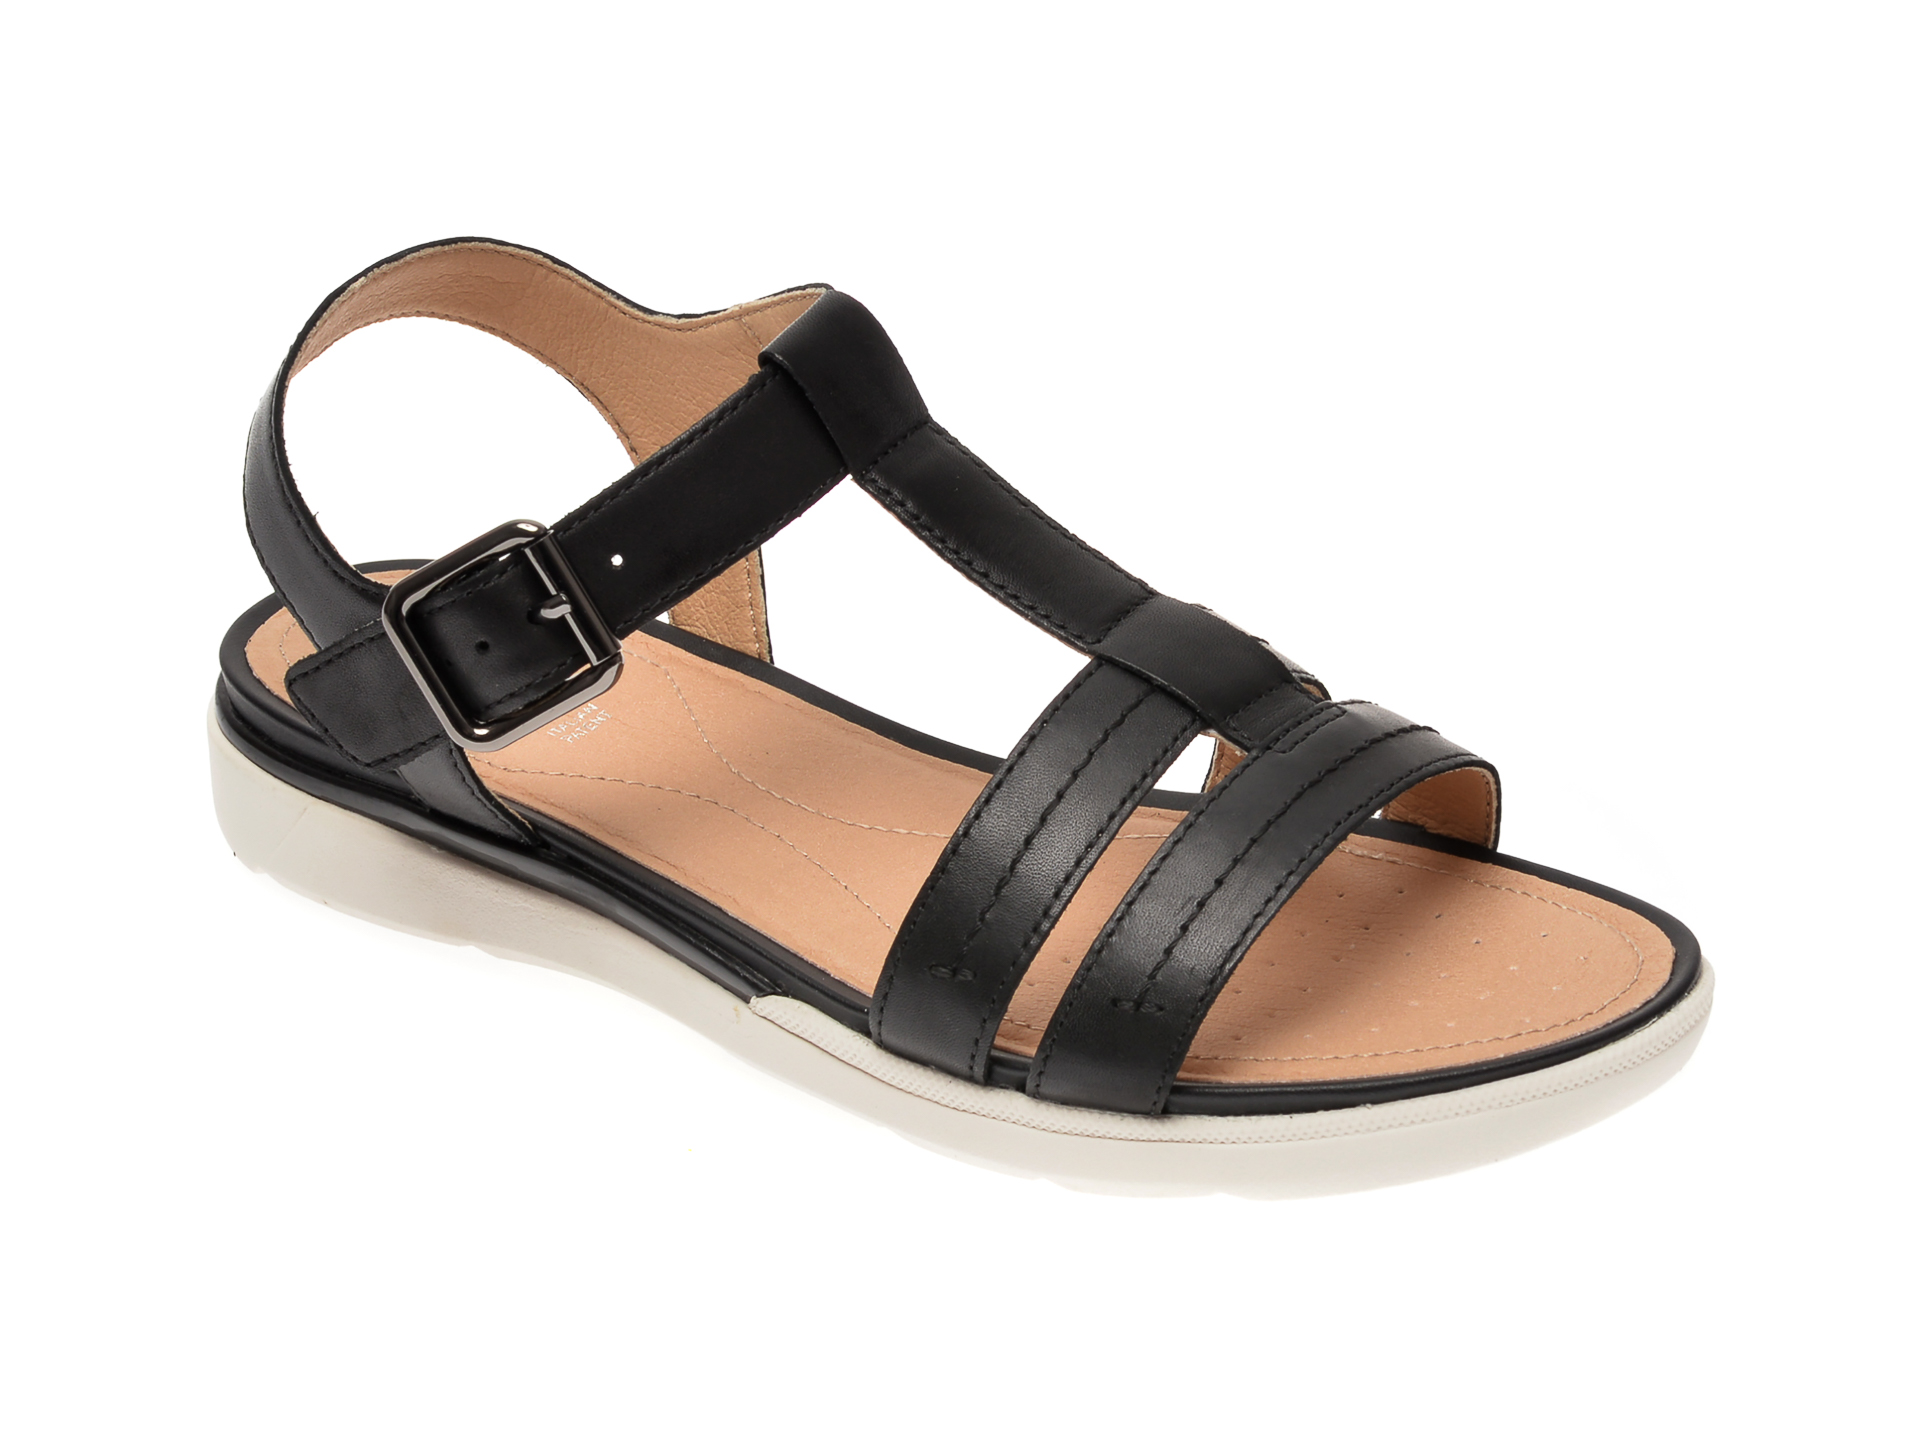 Sandale GEOX negre, D02GZB, din piele naturala